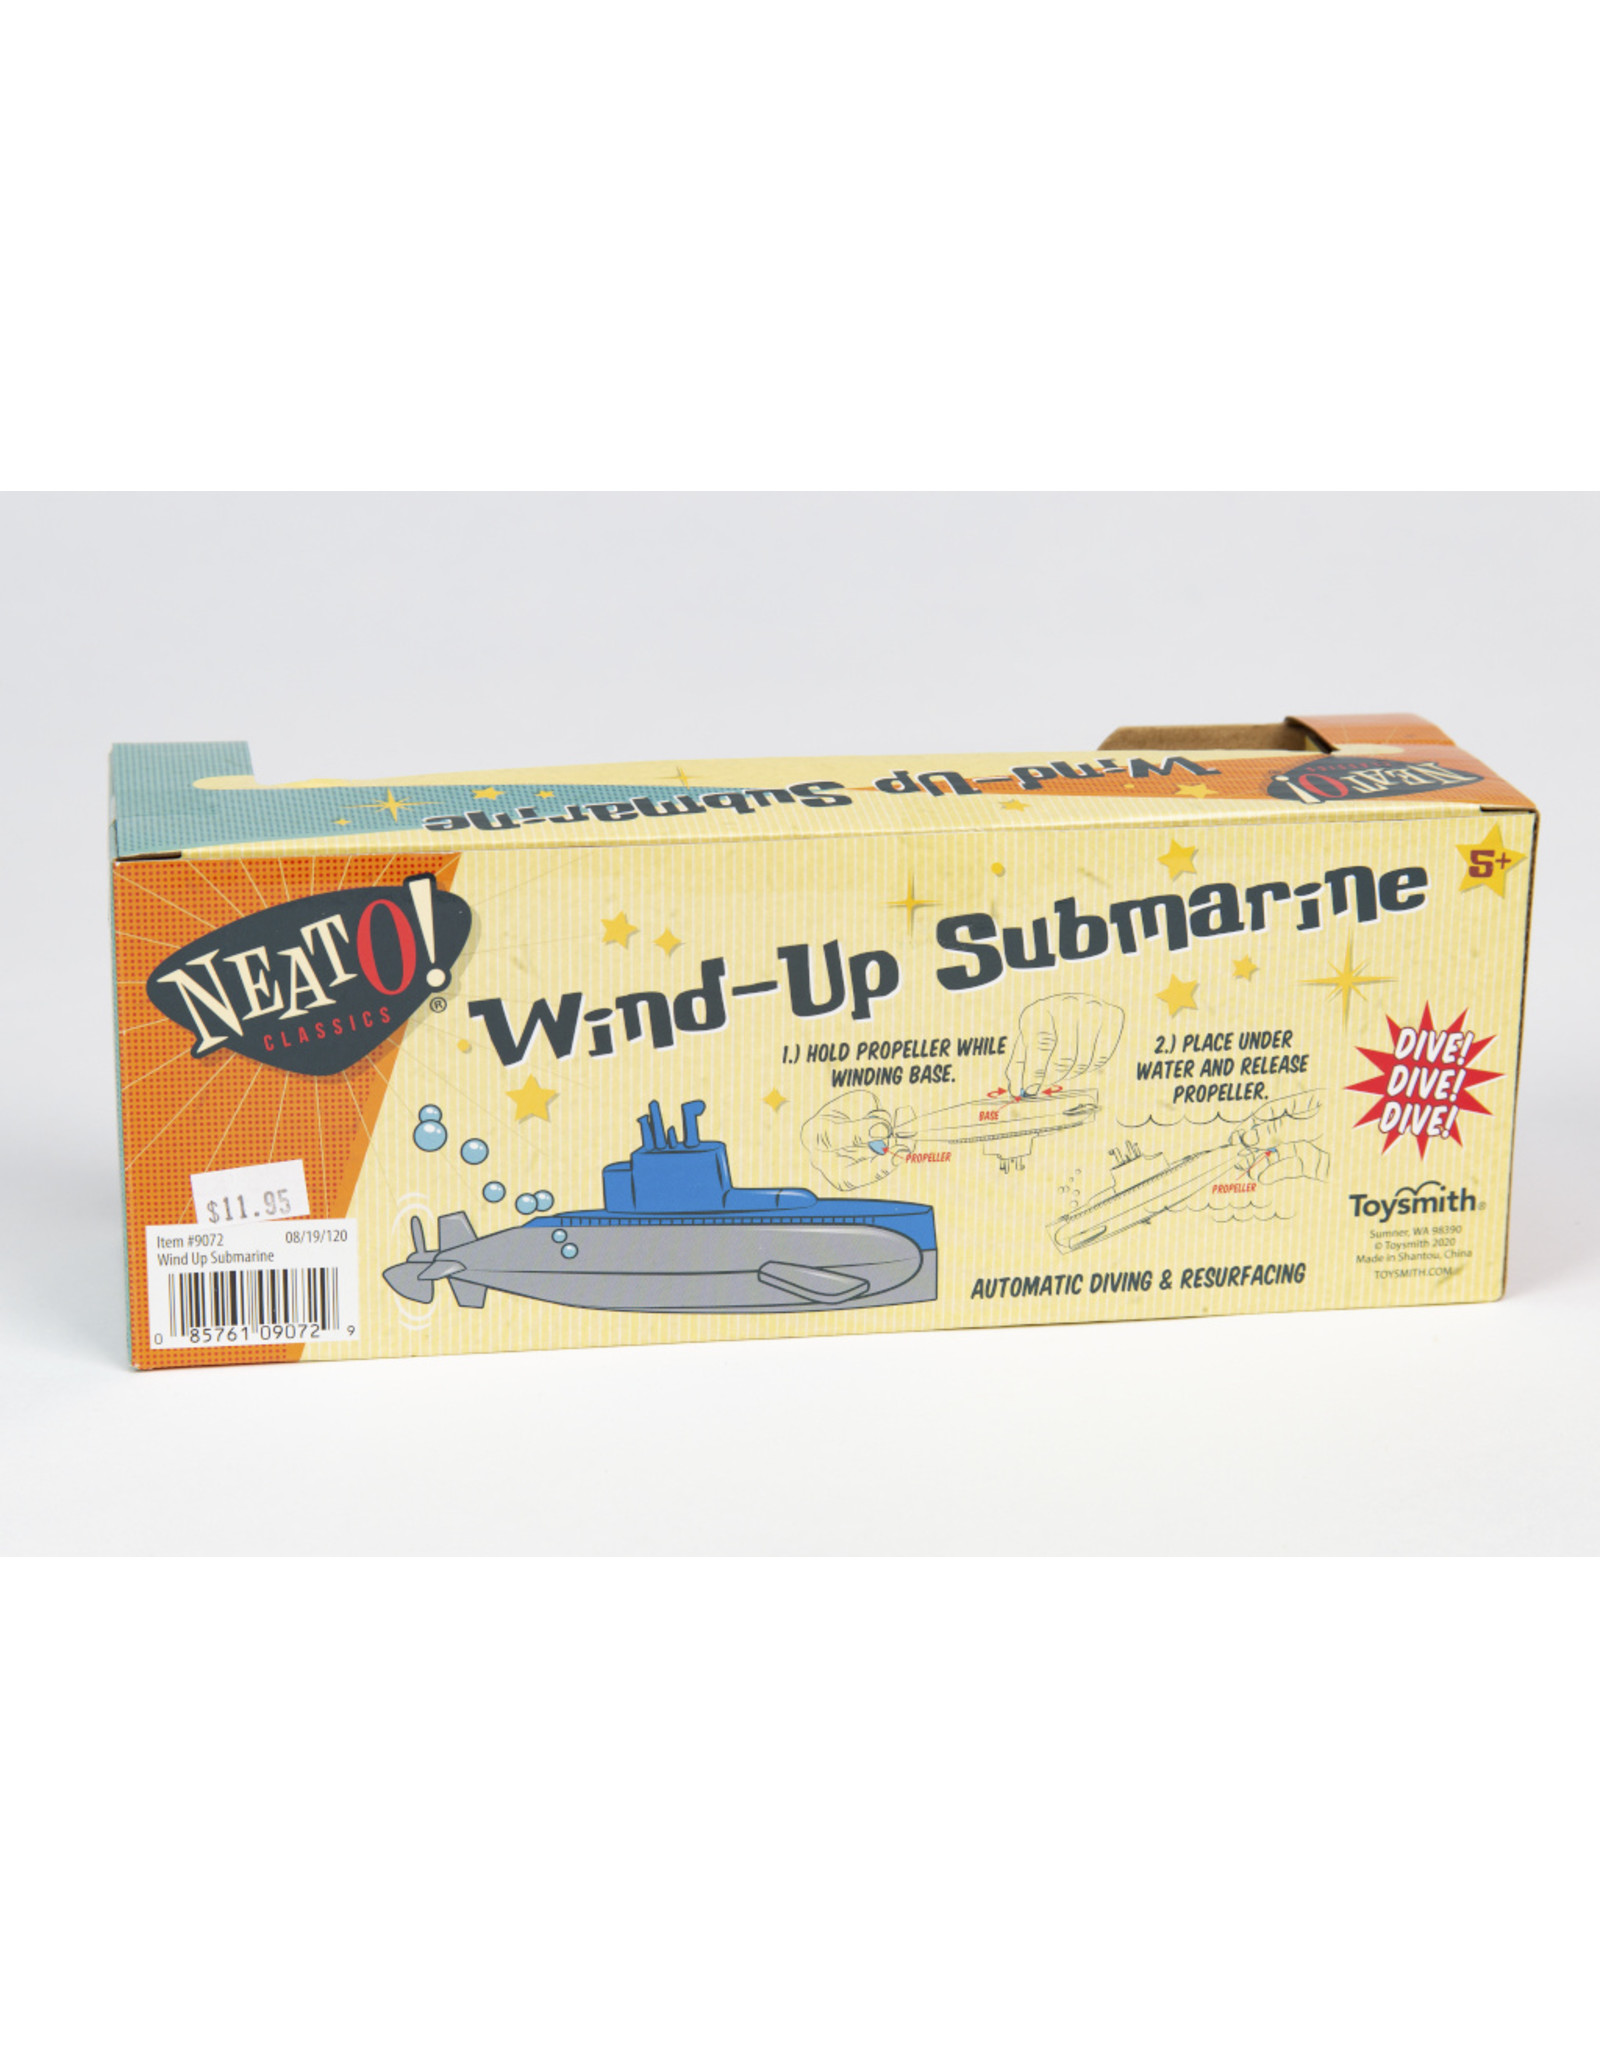 Wind Up Sub